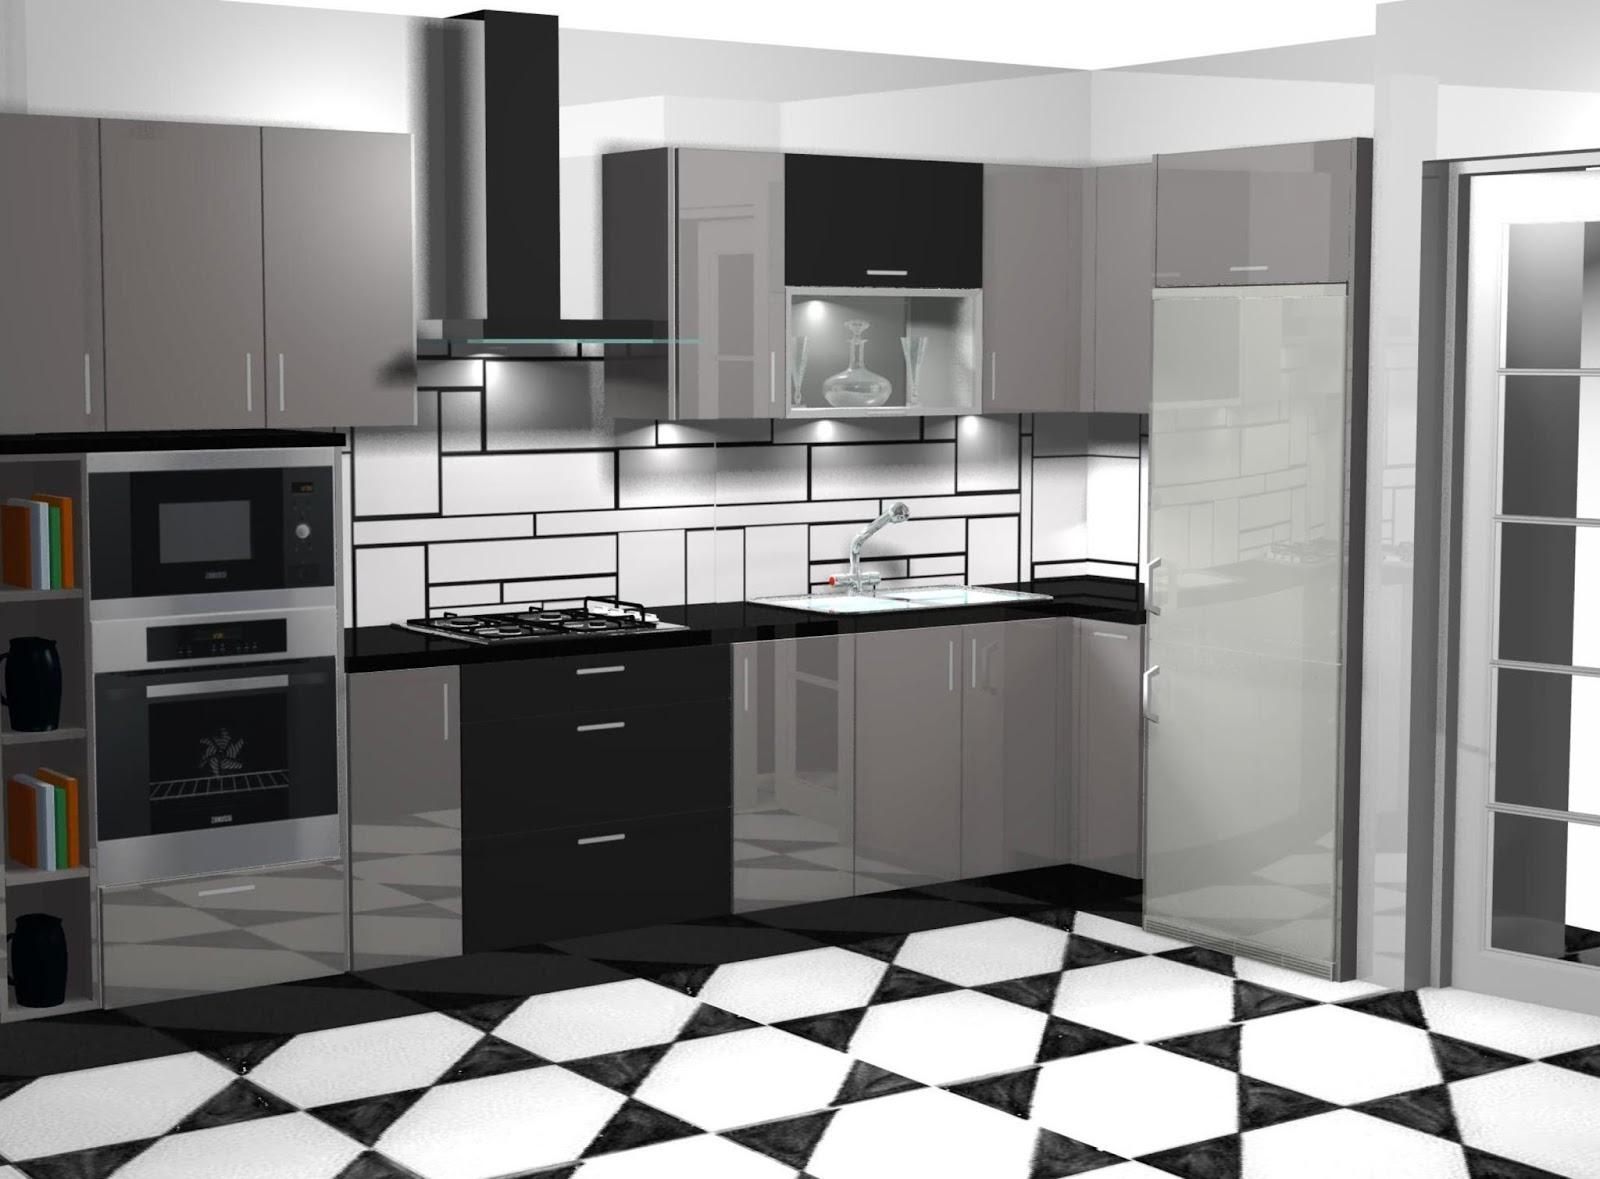 Dise o de cocina en alto brillo gris y negro for Aplicacion para diseno de cocinas